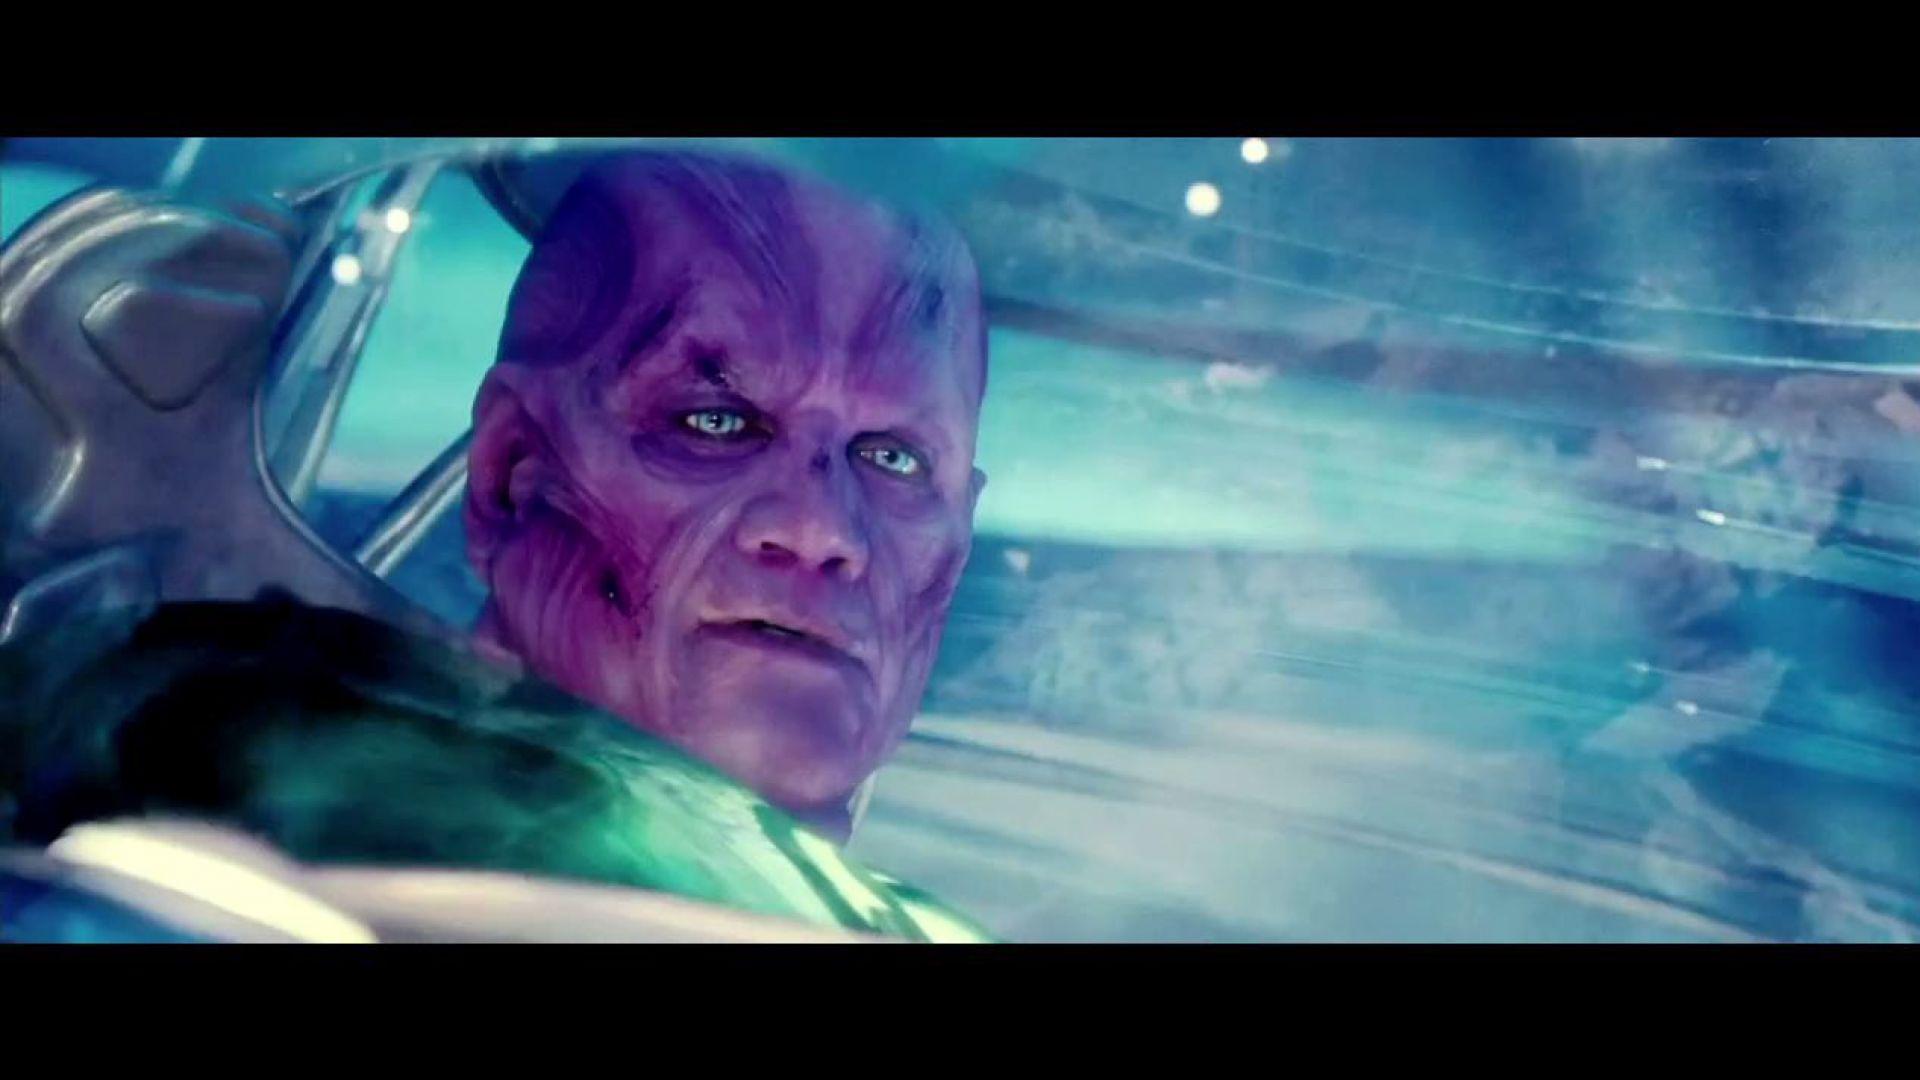 The oath, Green Lantern